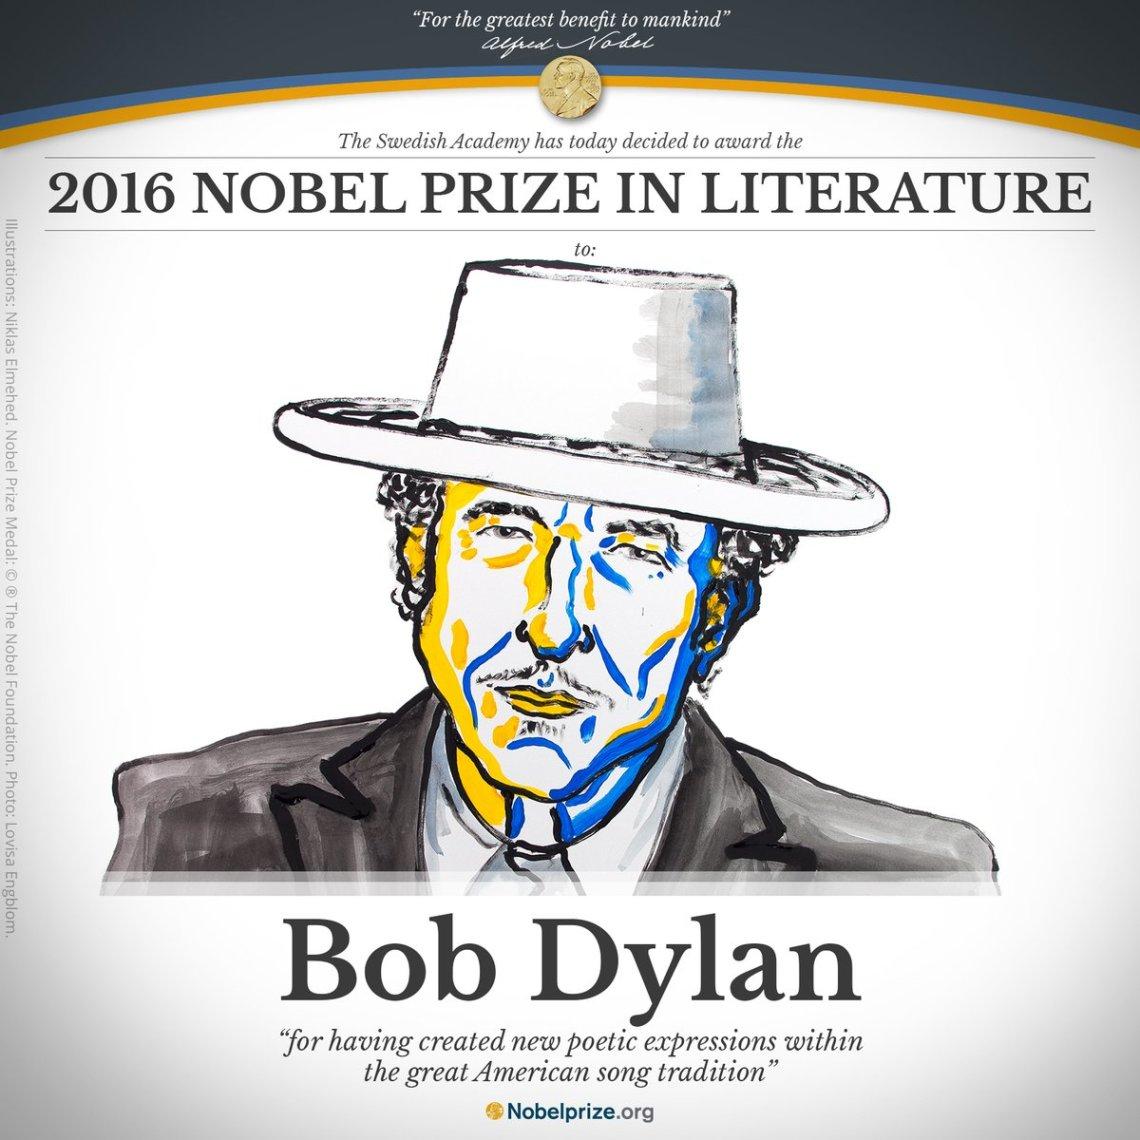 bob-dylan-nobel-prize